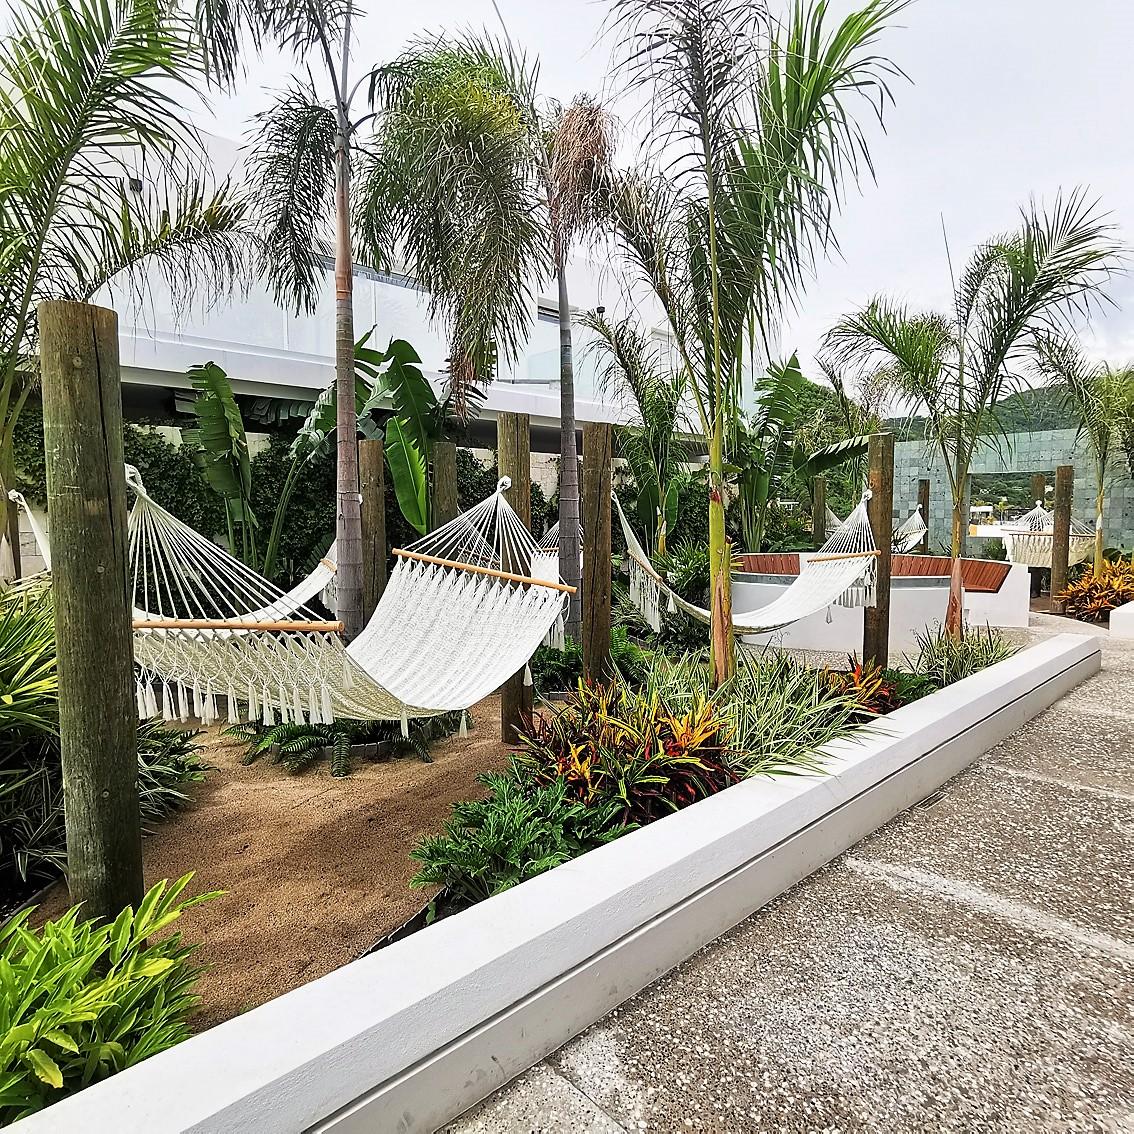 Condo Avida 410 - Romantic Zone Furnished Condo Old Town Puerto Vallarta (54)